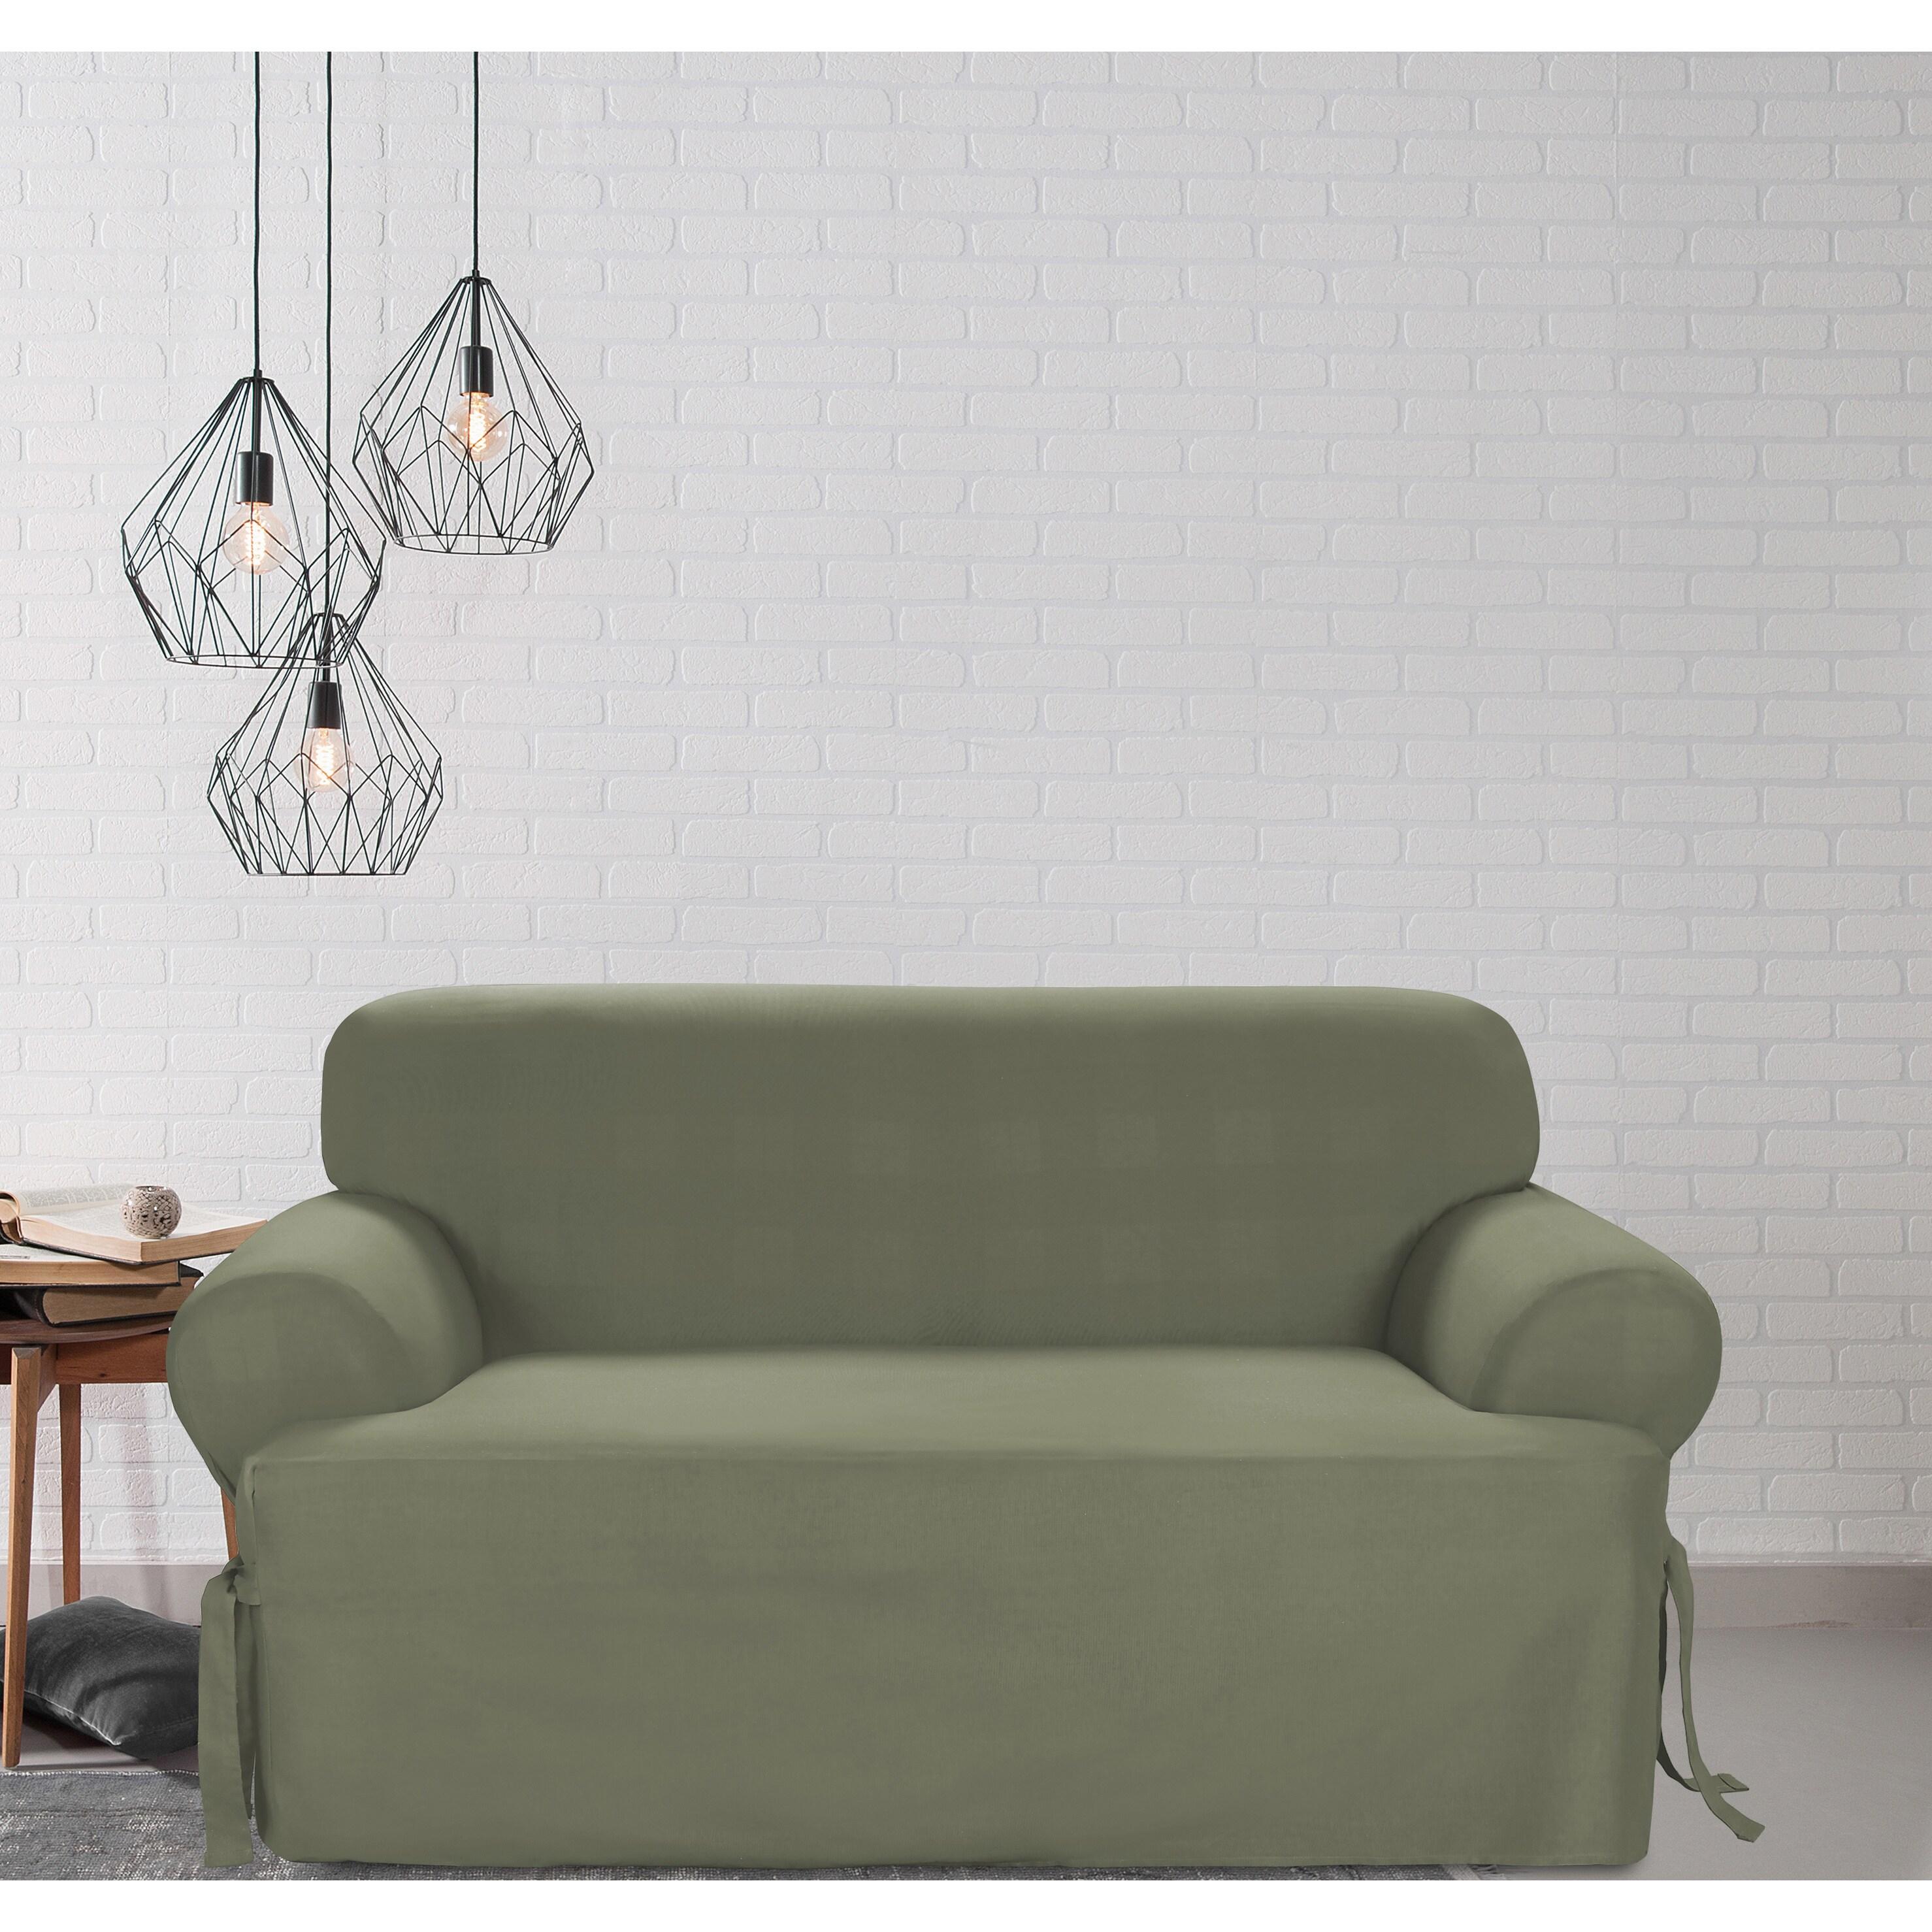 Fine Sure Fit Cotton Classic T Cushion Loveseat Slipcover Creativecarmelina Interior Chair Design Creativecarmelinacom